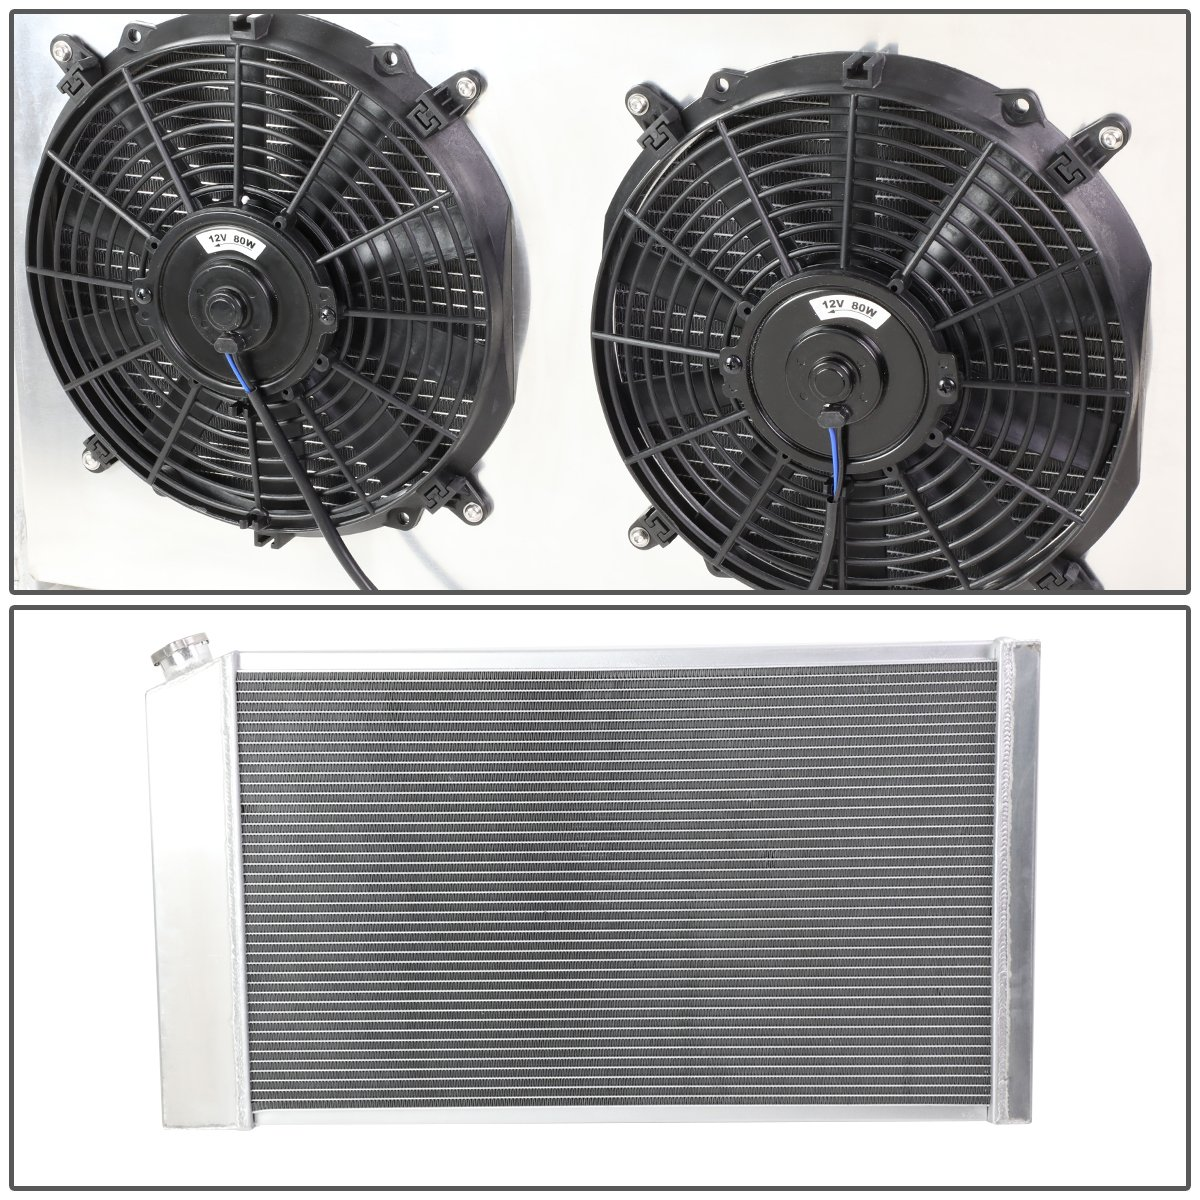 DNA Motoring RA+FS-CHEVYT73-3 3-Row Aluminum Radiator with Fan Shroud